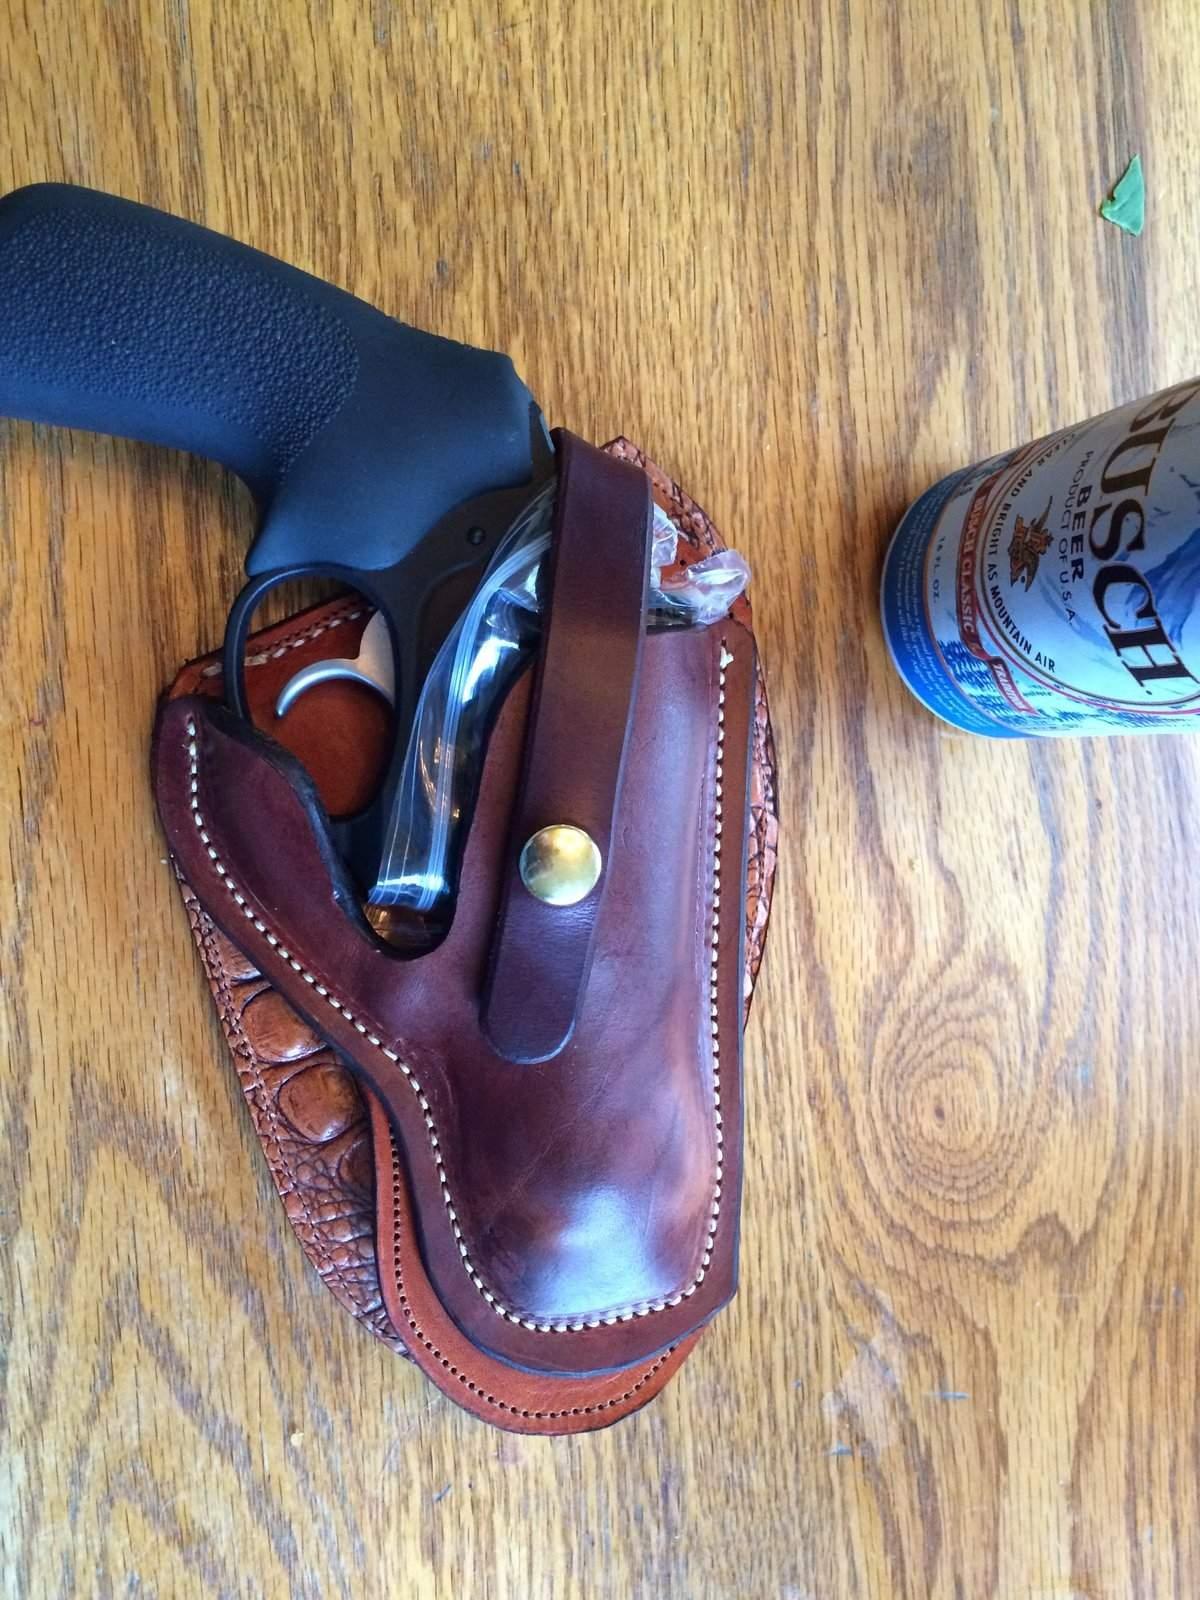 WTT OR - Ruger LCRx 3 inch | Northwest Firearms - Oregon